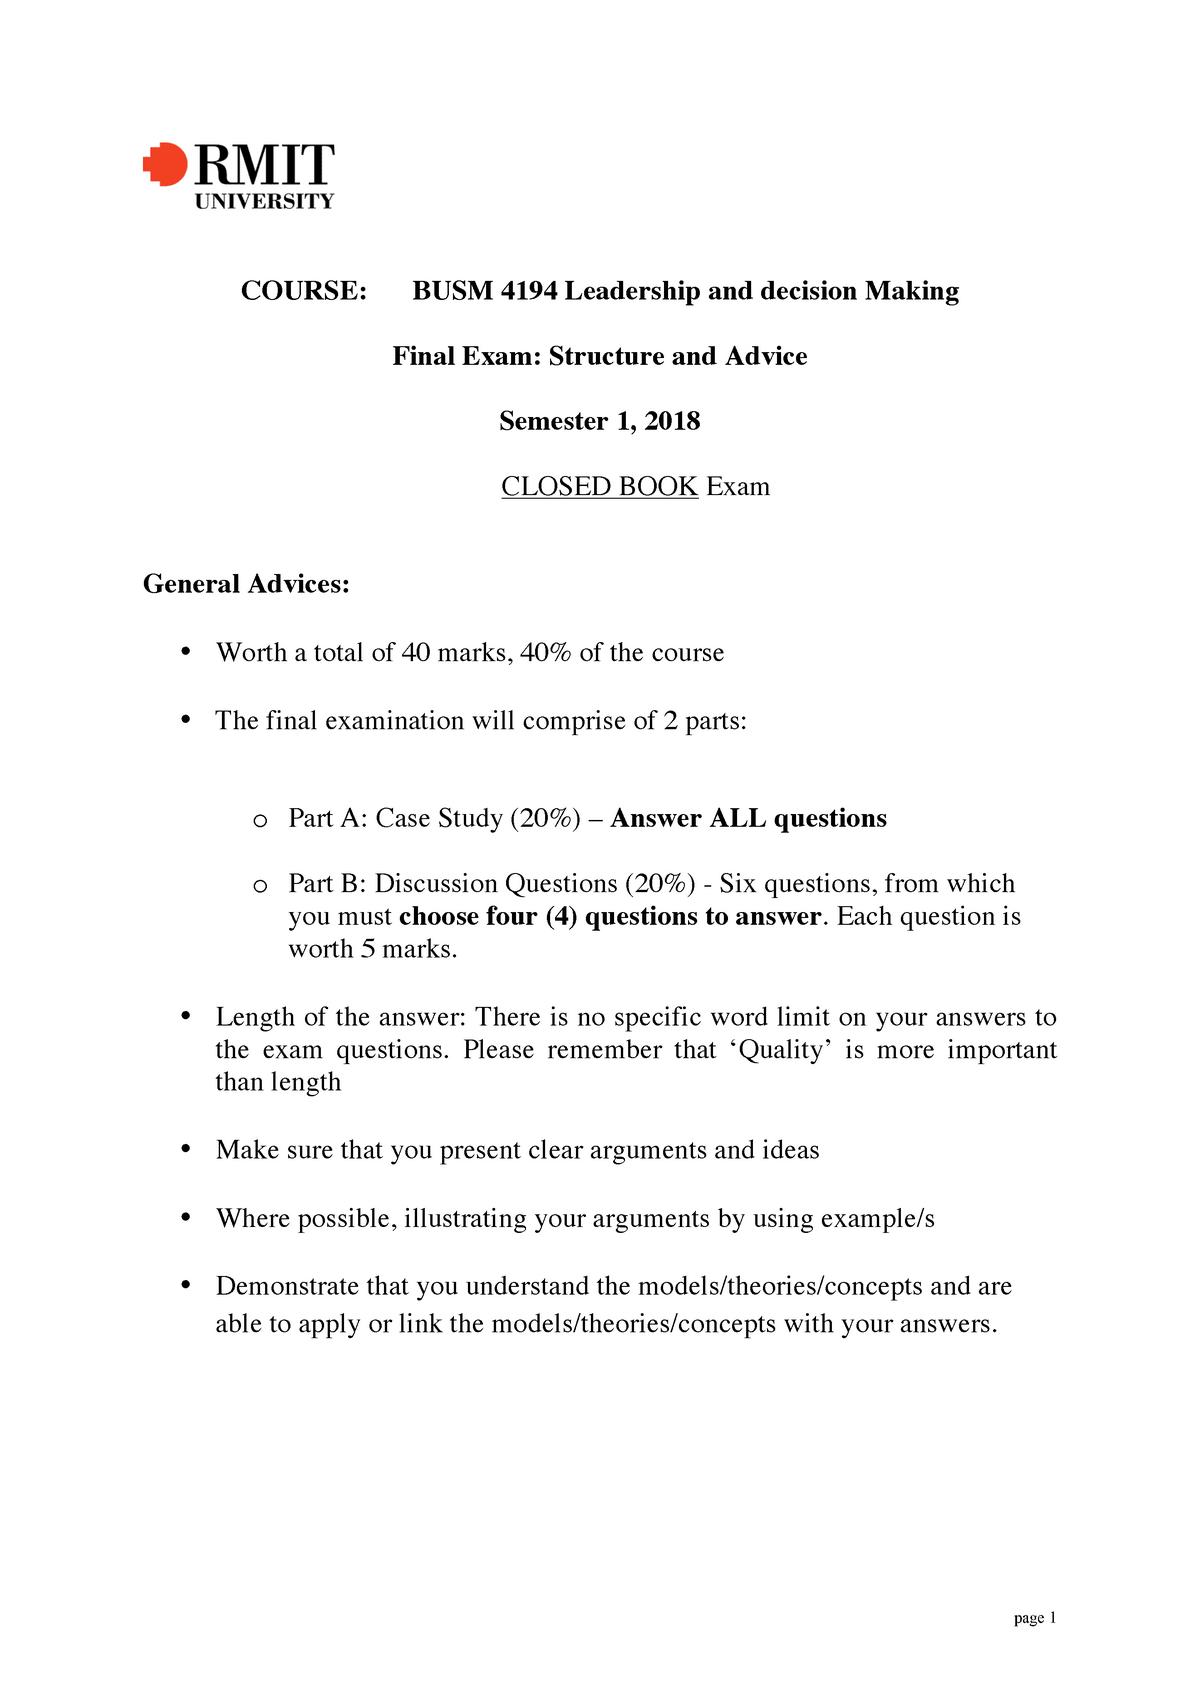 Final BUSM4194 Exam advices-2 - RMIT - StuDocu